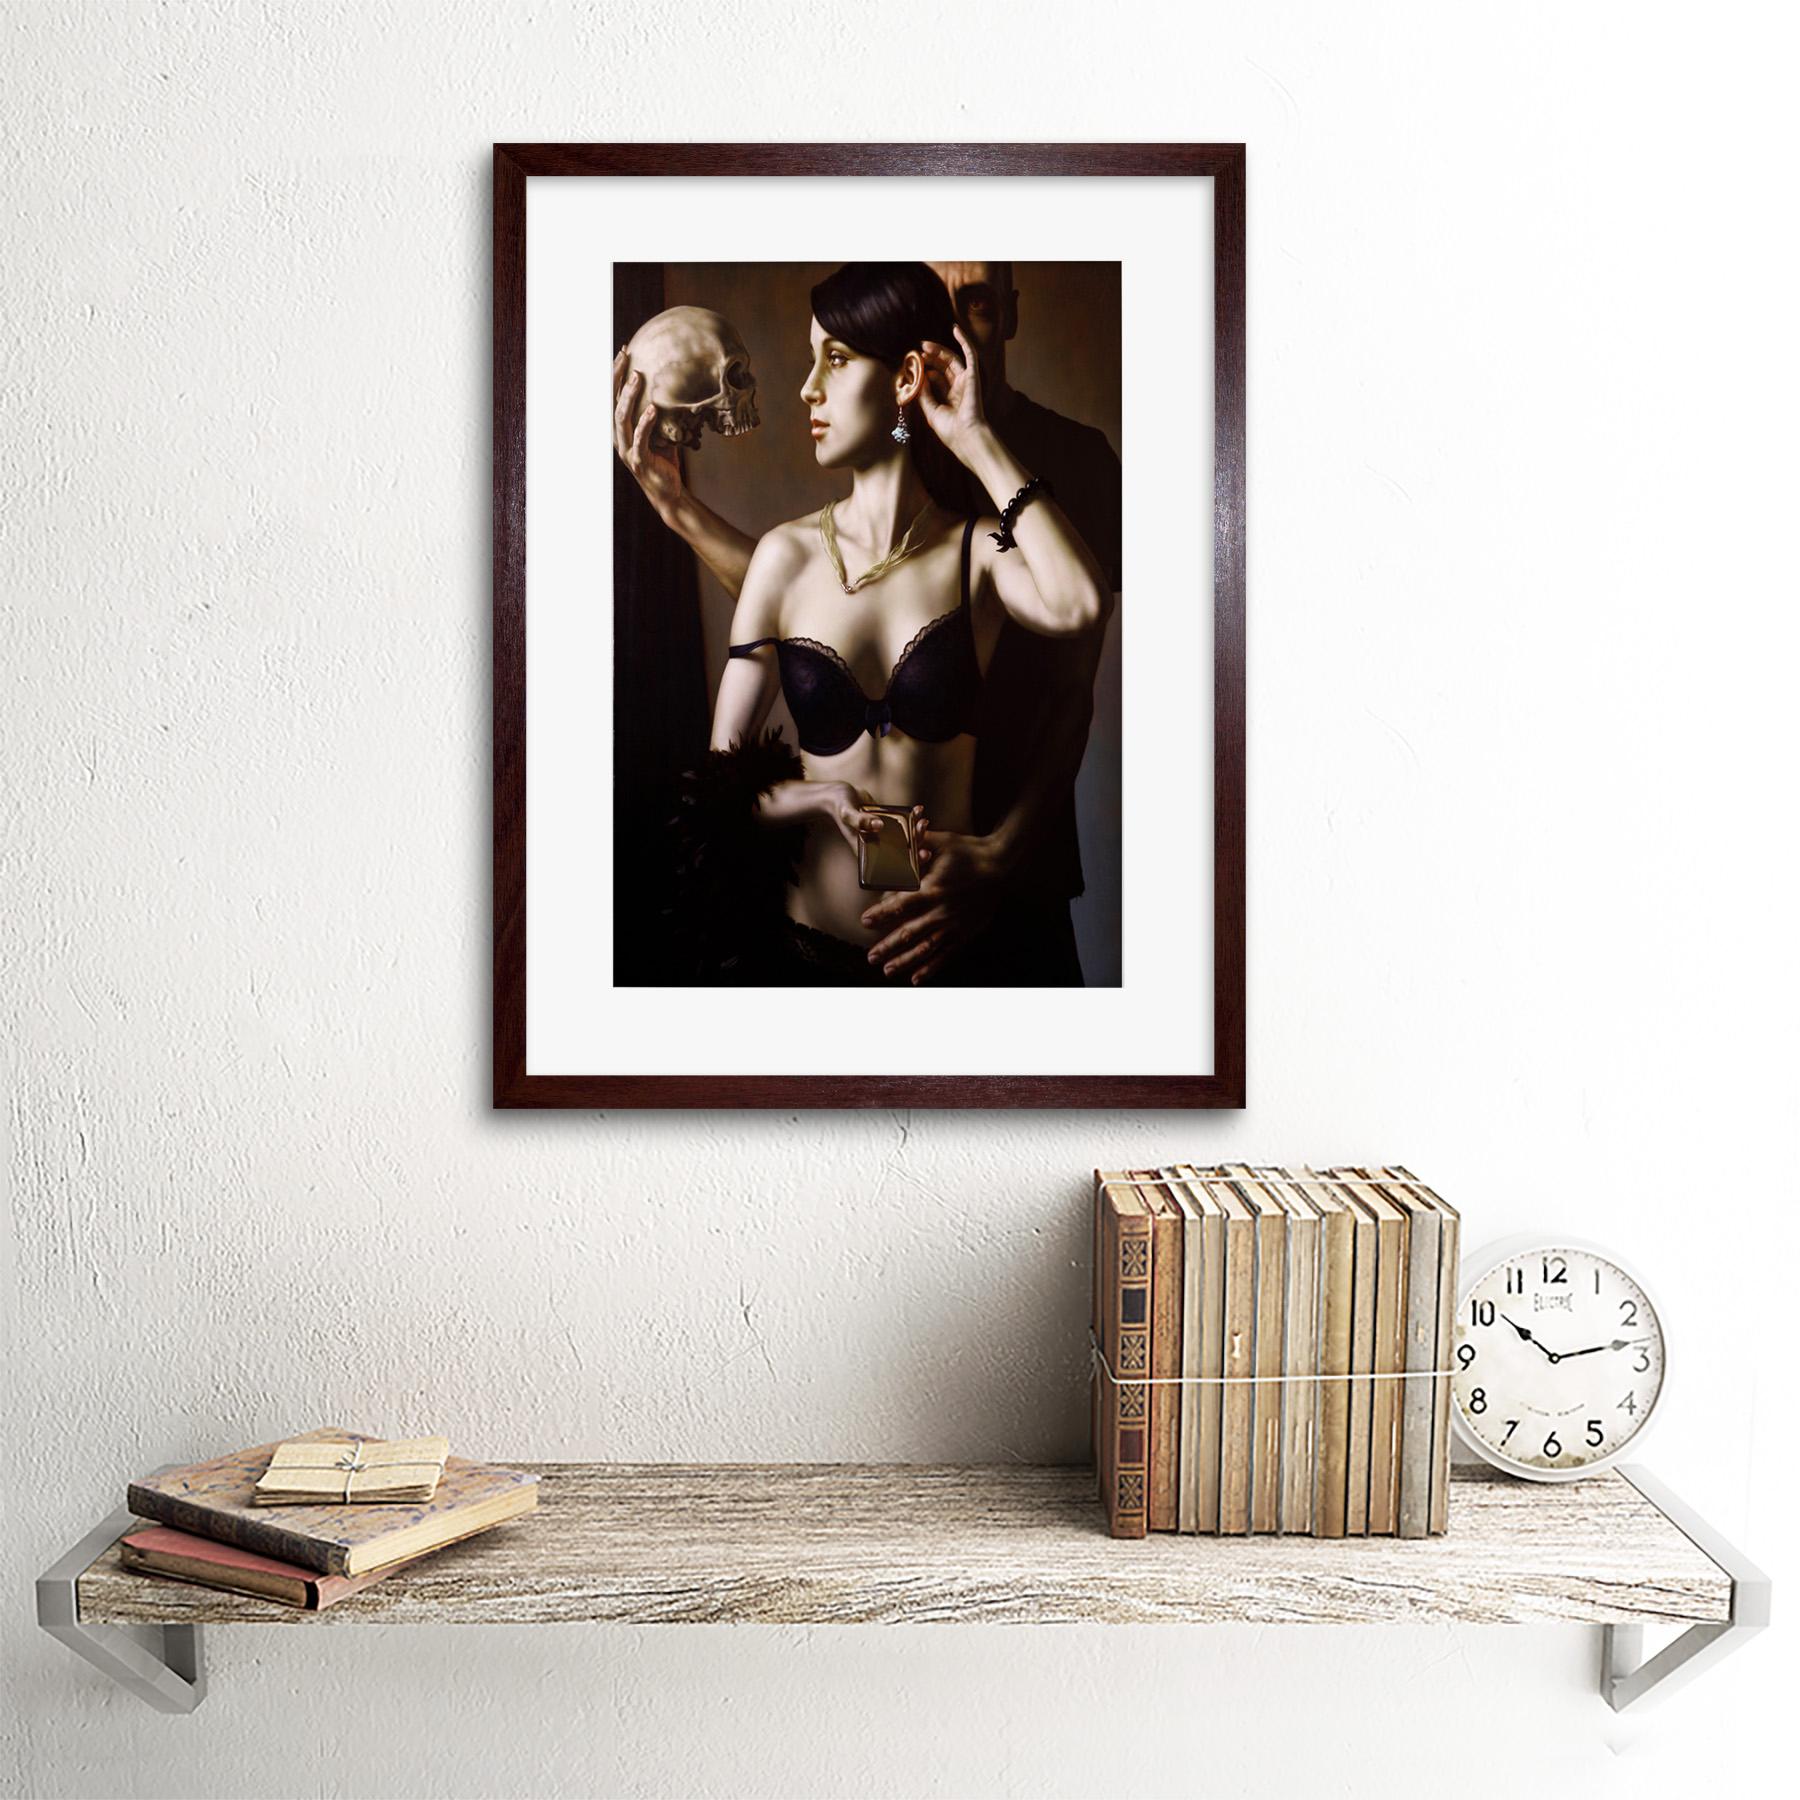 Painting-Balcar-Send-Me-To-The-Future-Framed-Art-Print-12x16-Inch 縮圖 8